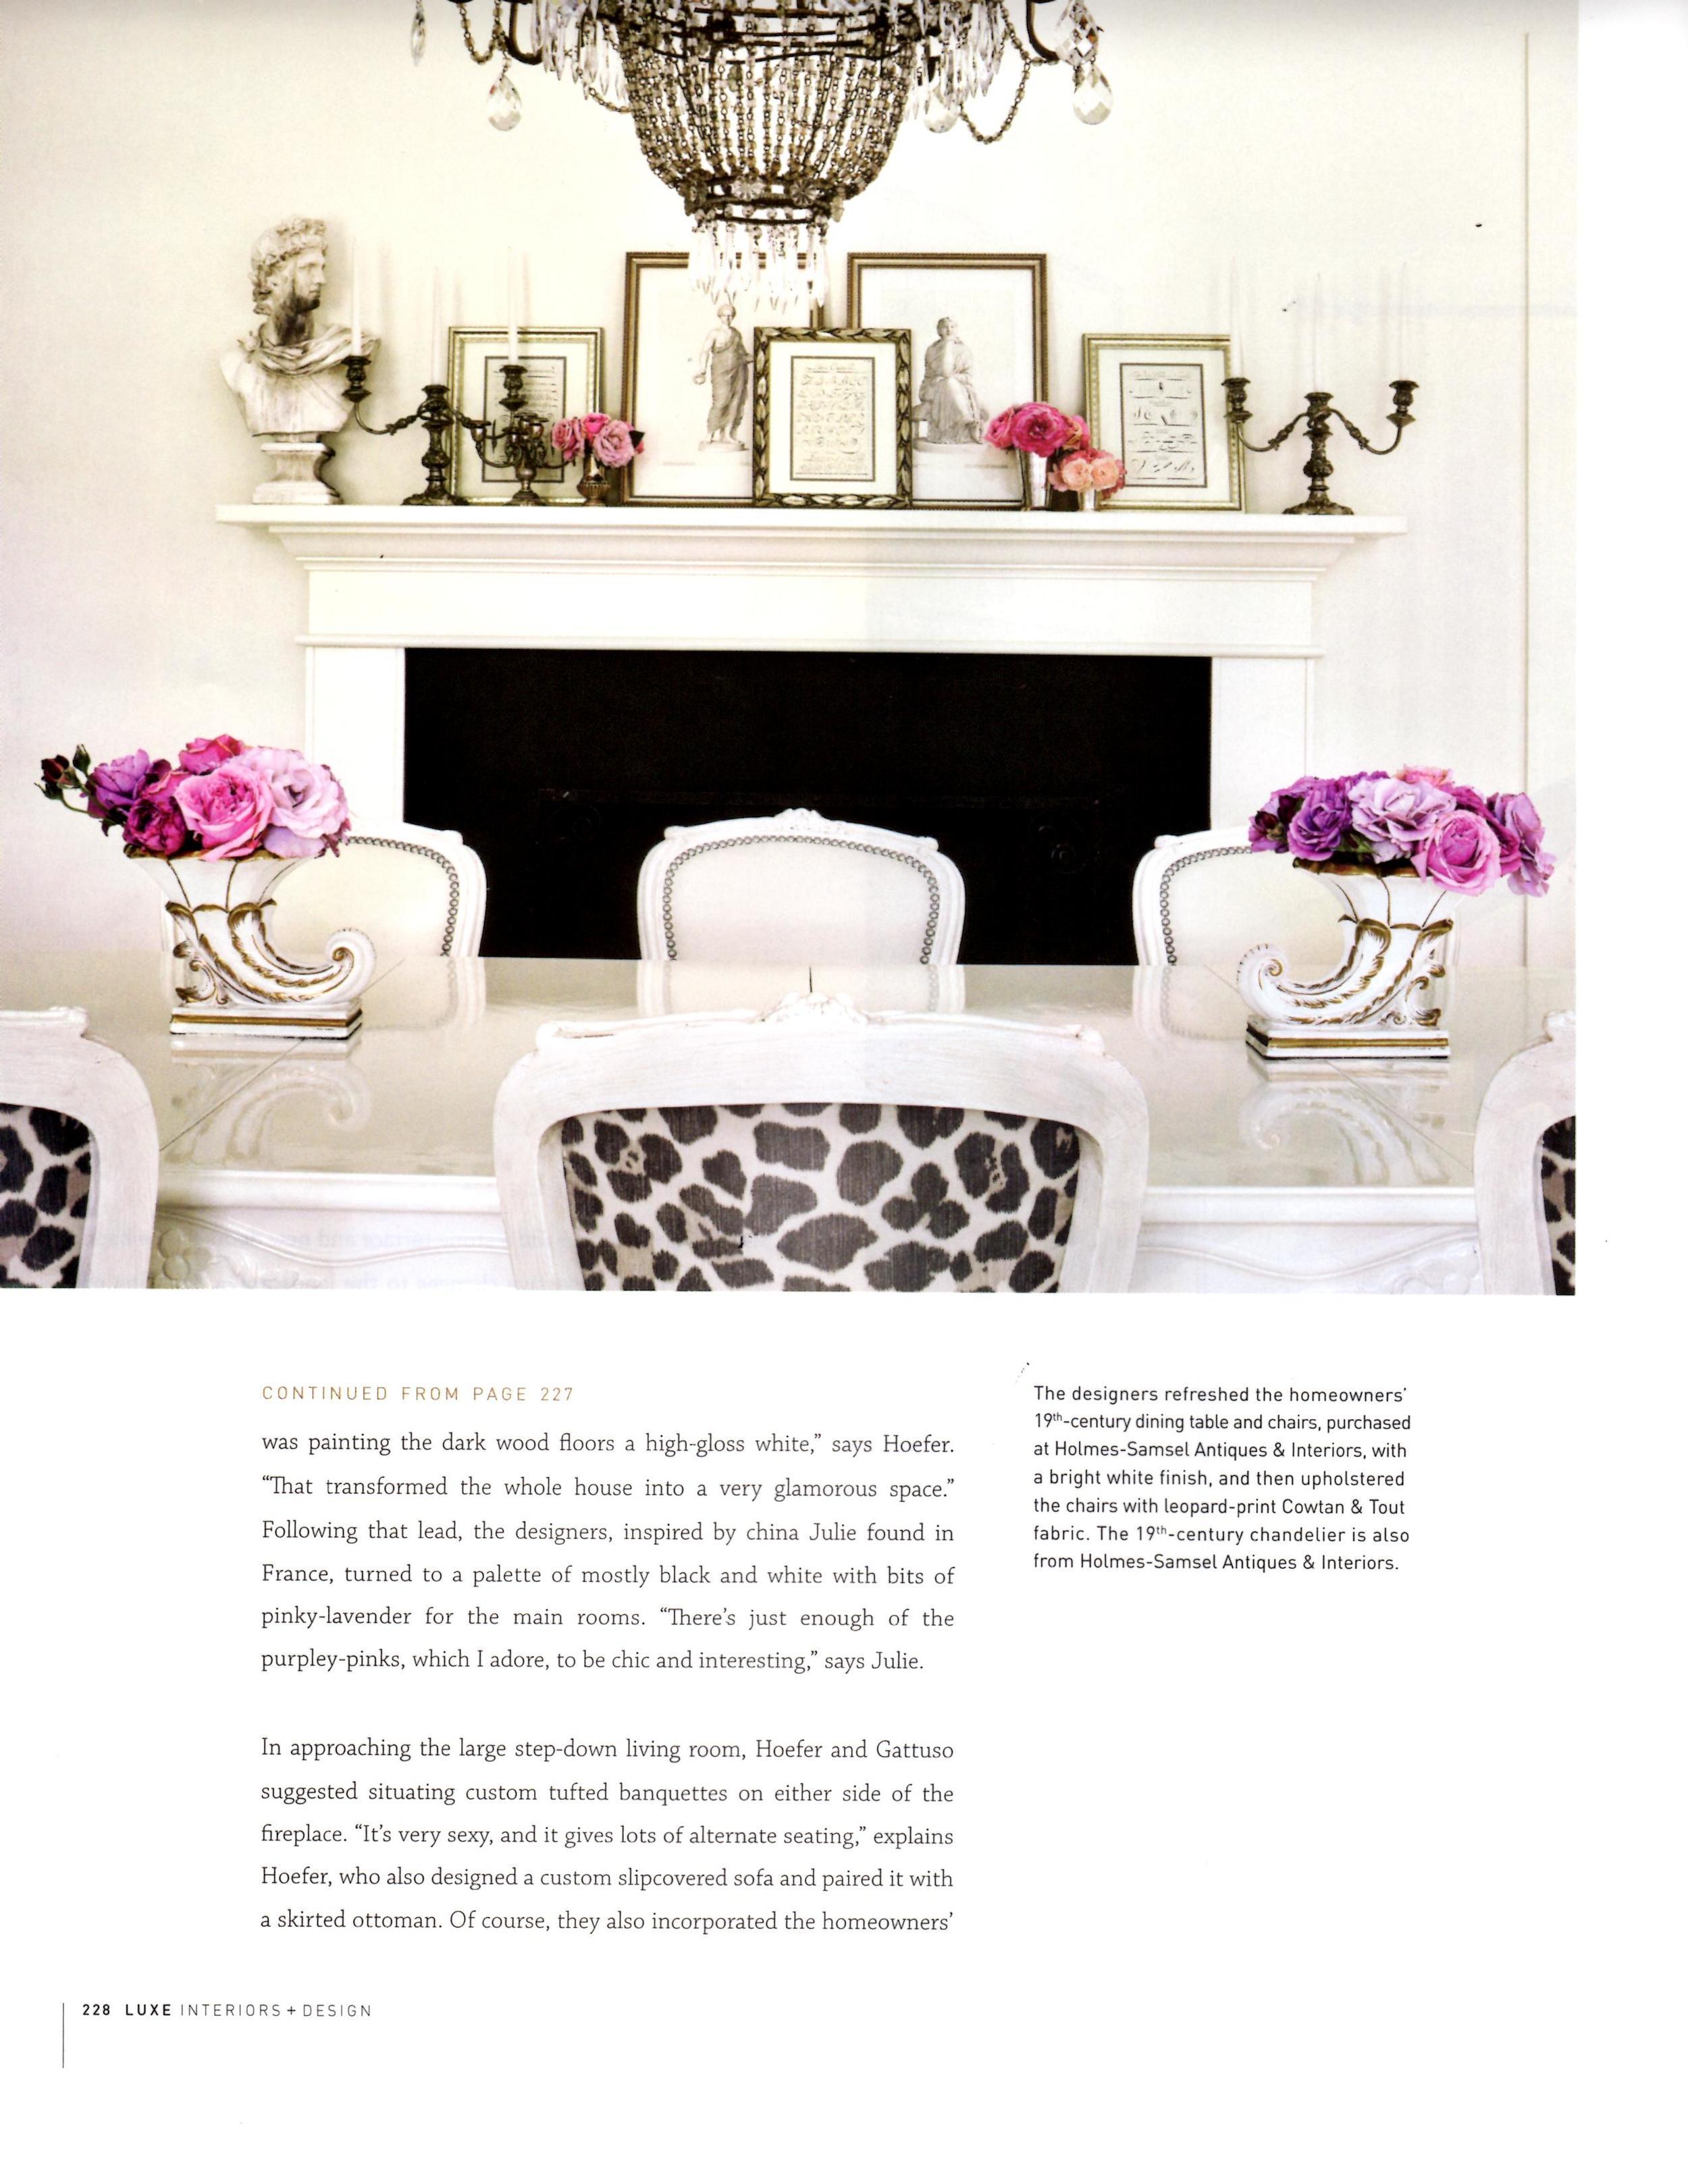 myrahoeferdesign_luxe_magazine_6.jpg